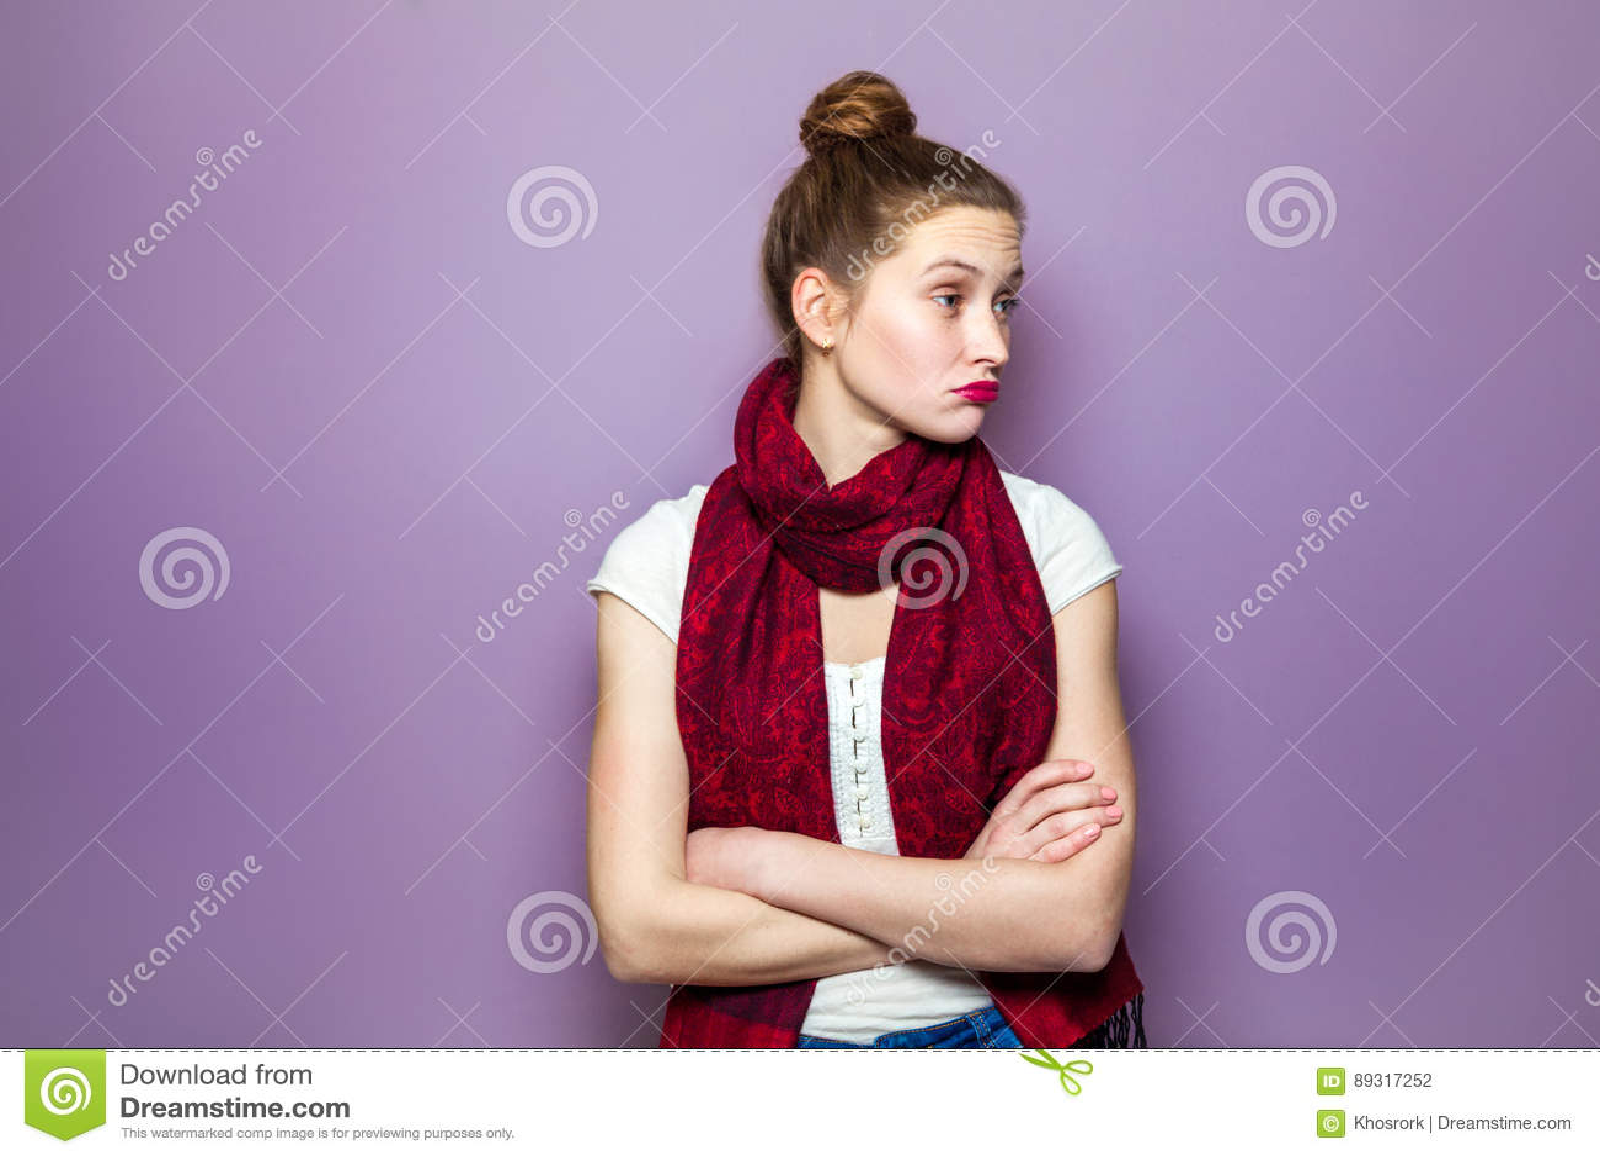 Human expressions emotions feelings body language.